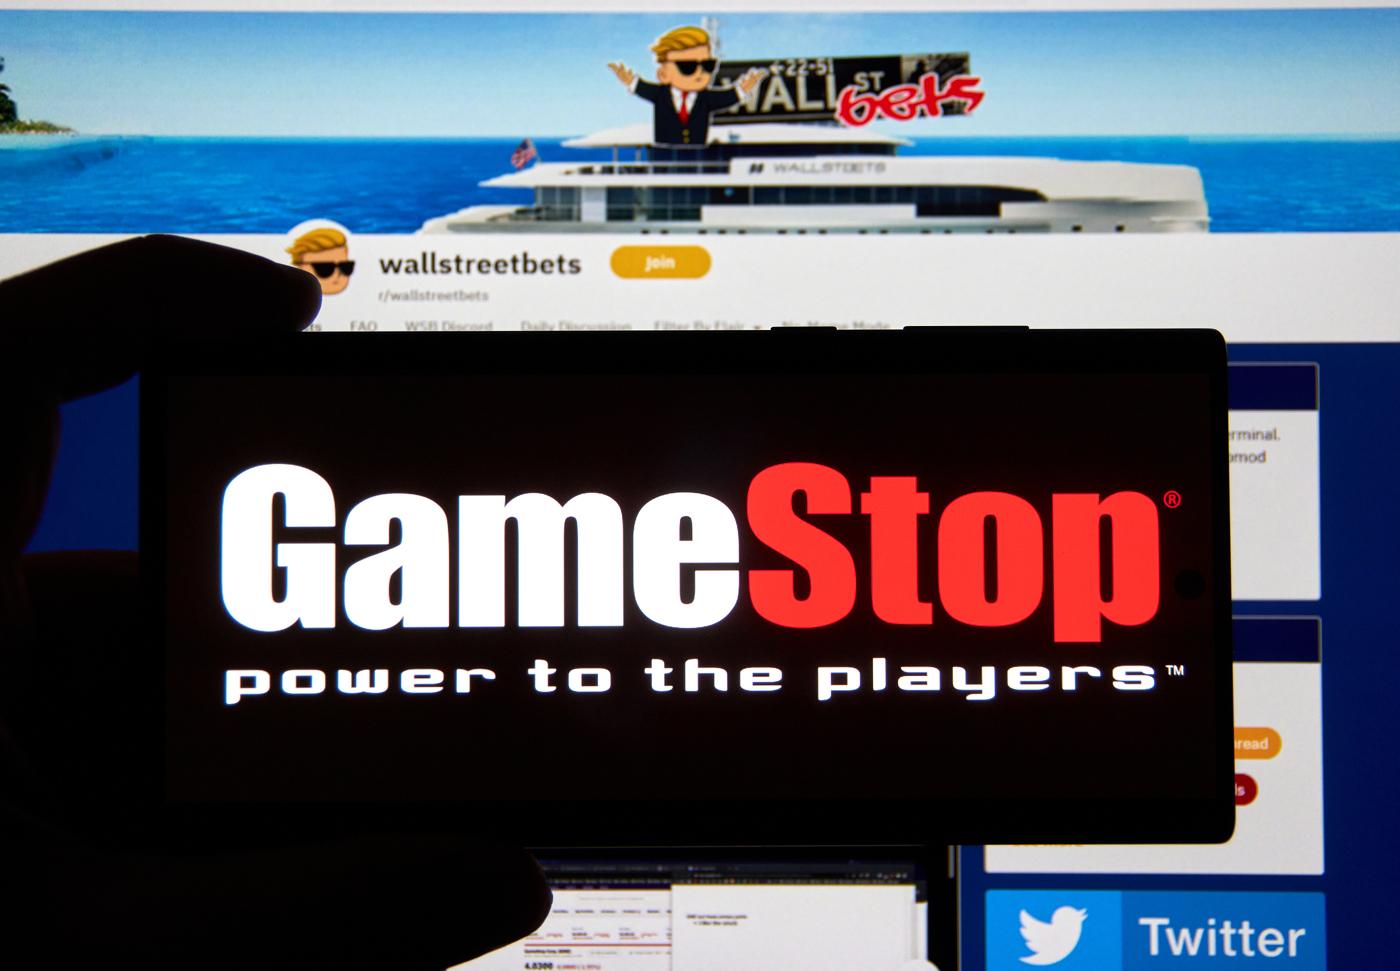 Gamestop stock, GME stock, WallStreetBets, Reddit traders, meme stocks